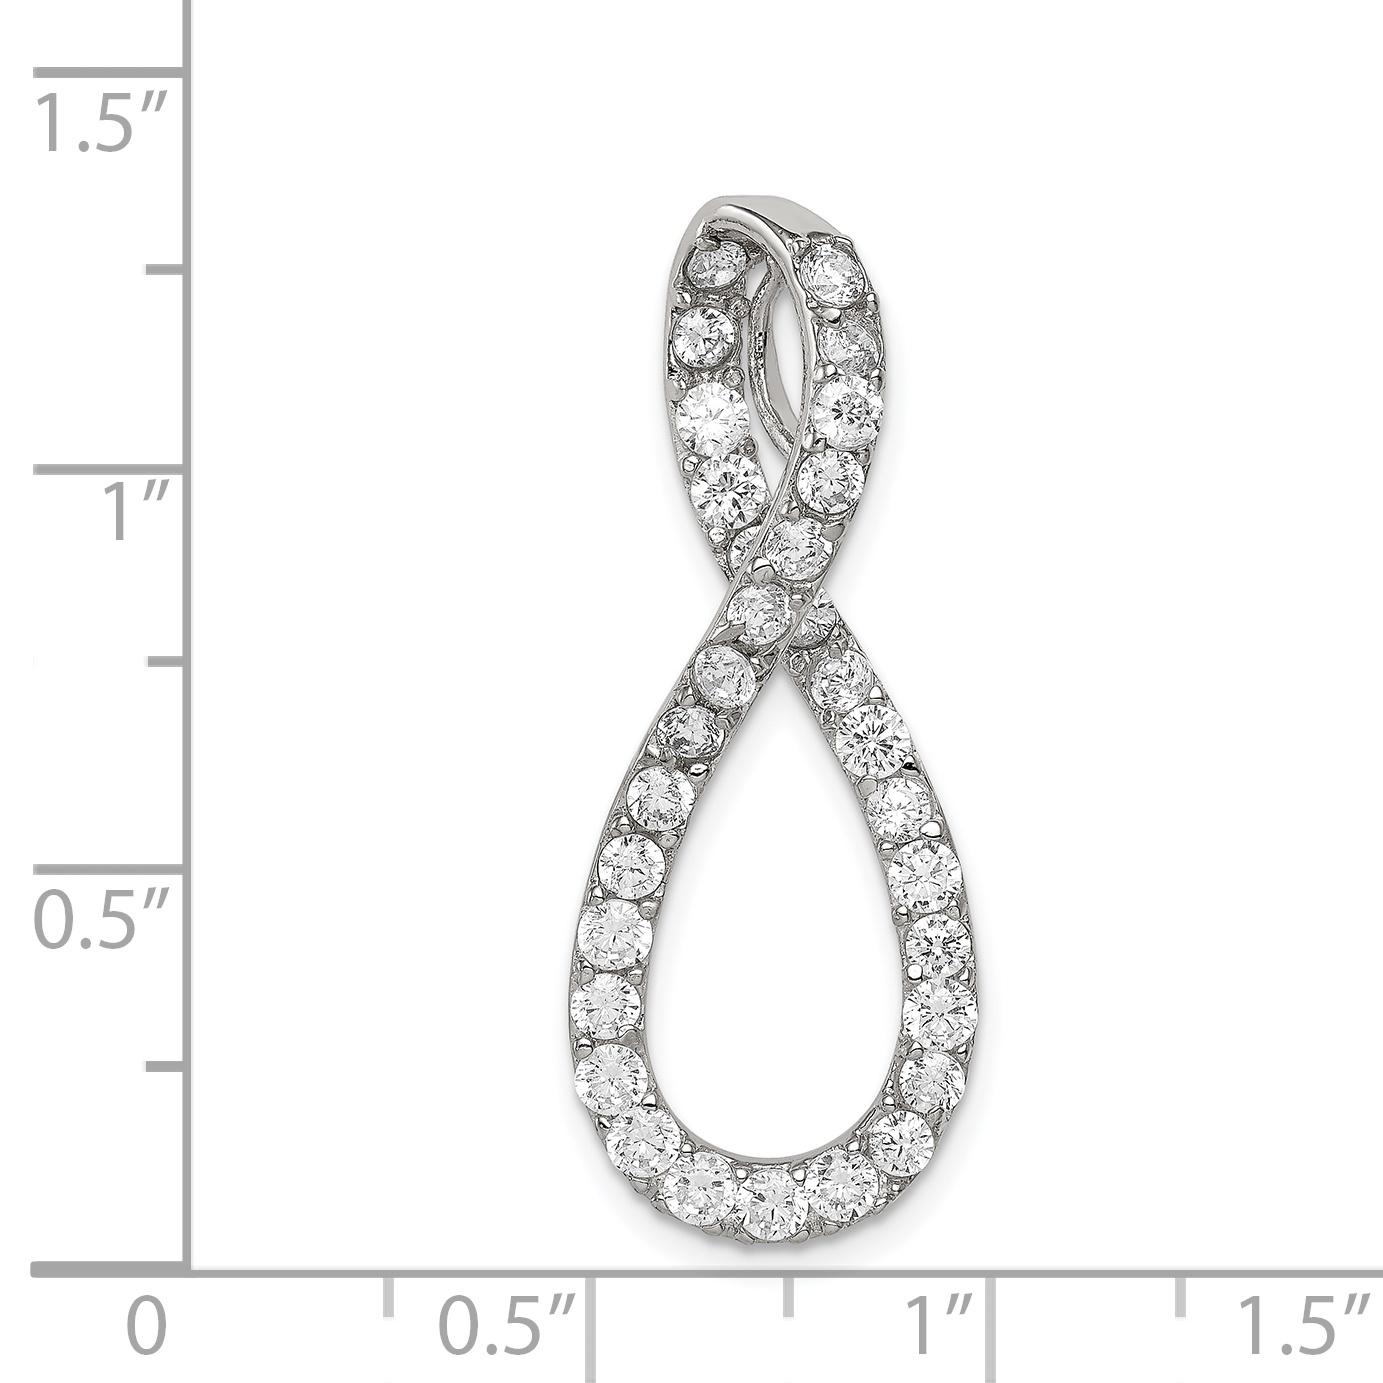 925 Sterling Silver Cubic Zirconia Fancy Pendant - image 1 de 2